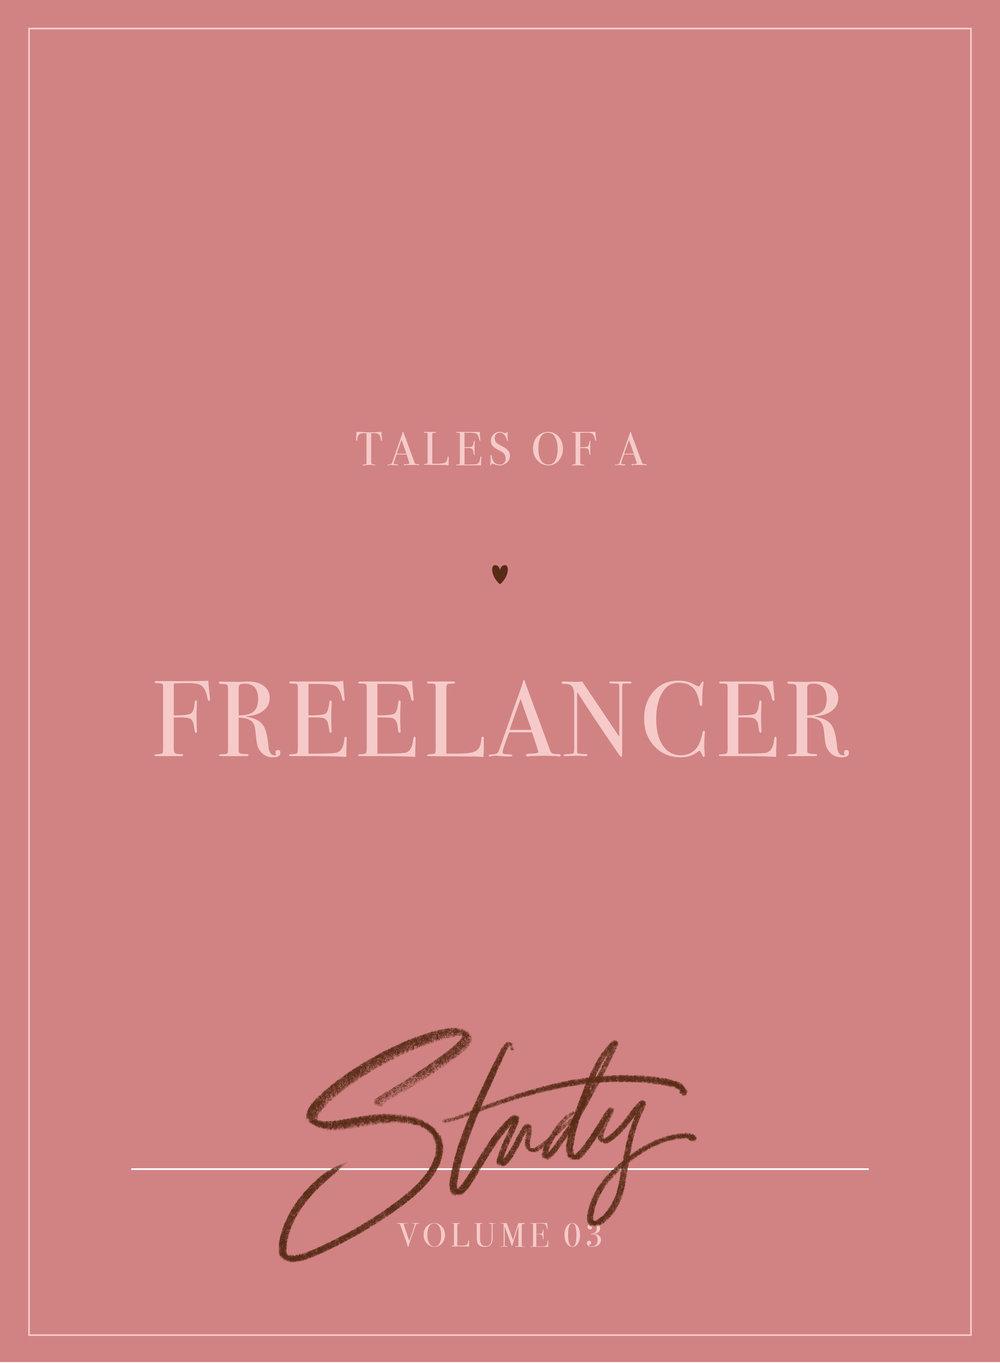 TalesofAFreelancer_Study.jpg